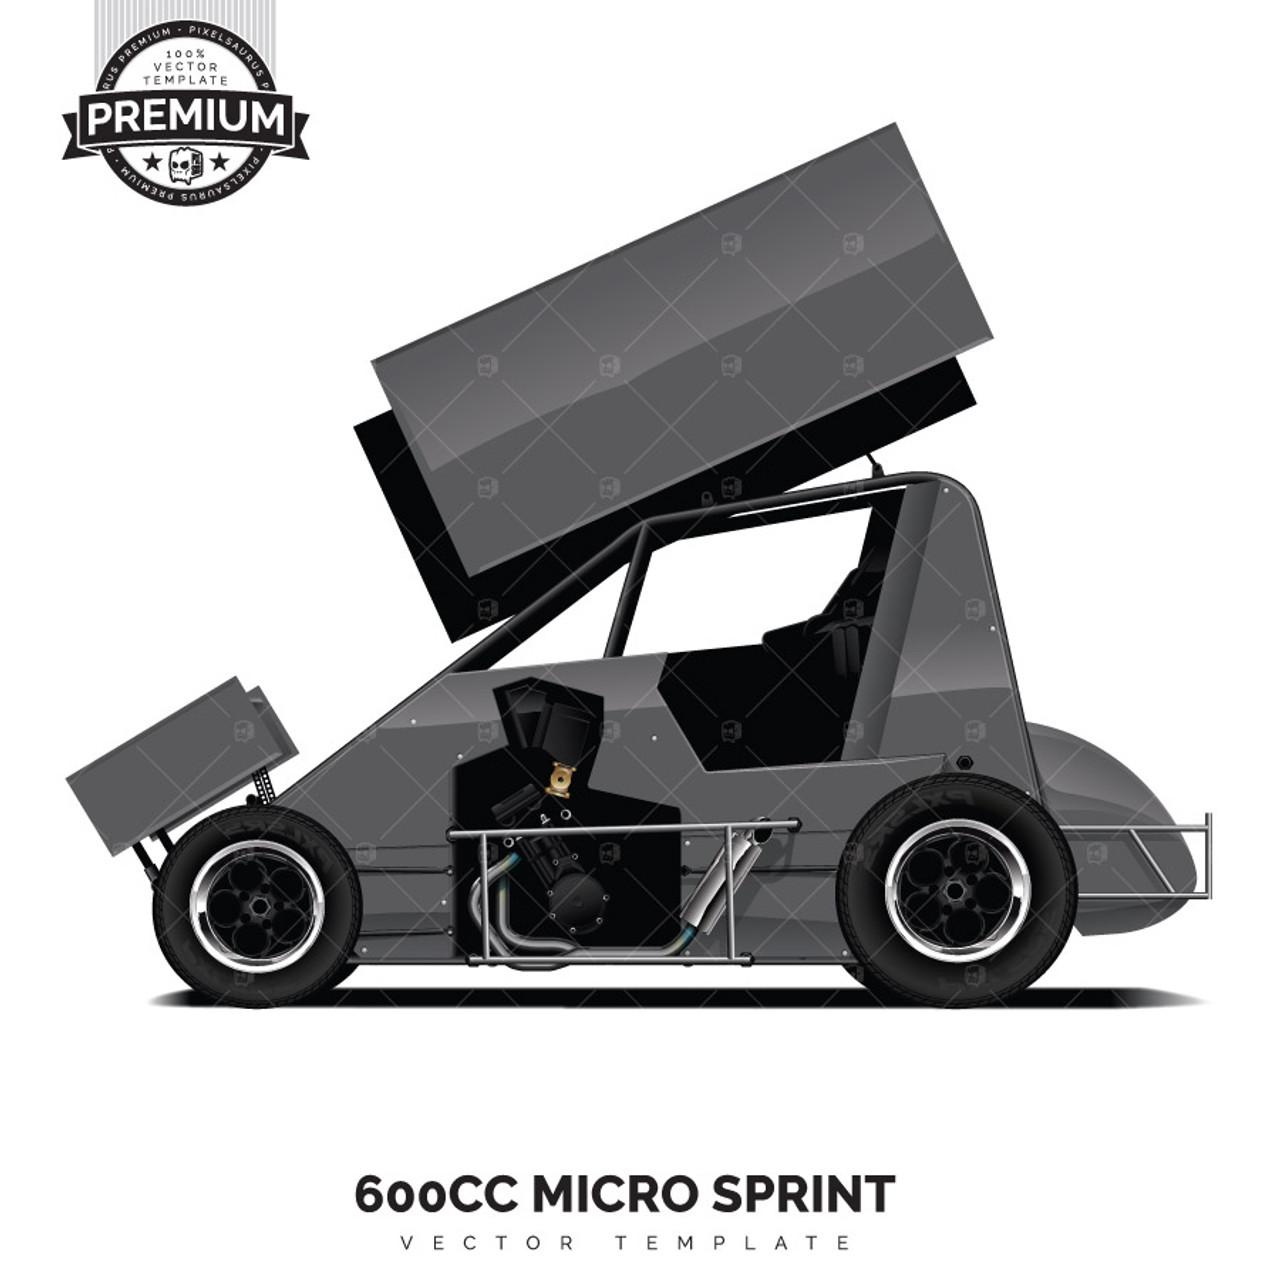 600cc Micro Sprint Premium Vector Template